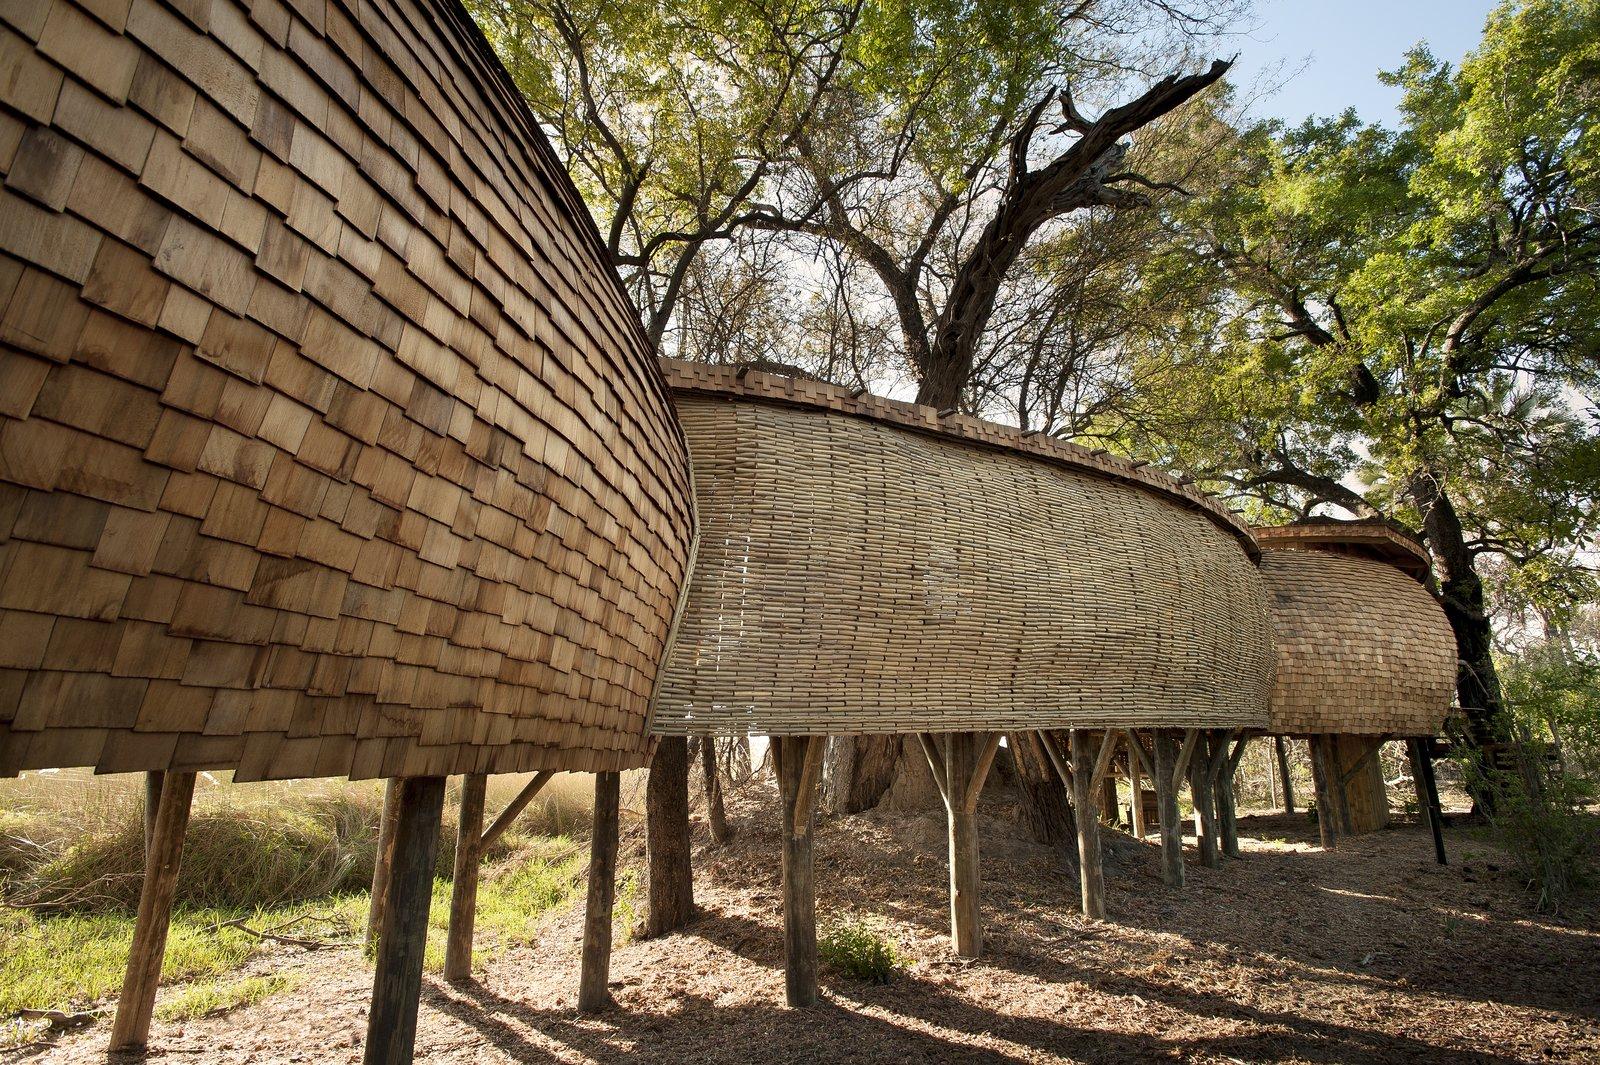 Photo 5 of 13 in Eco-Friendly Safari Lodge in Africa's Okavango Delta